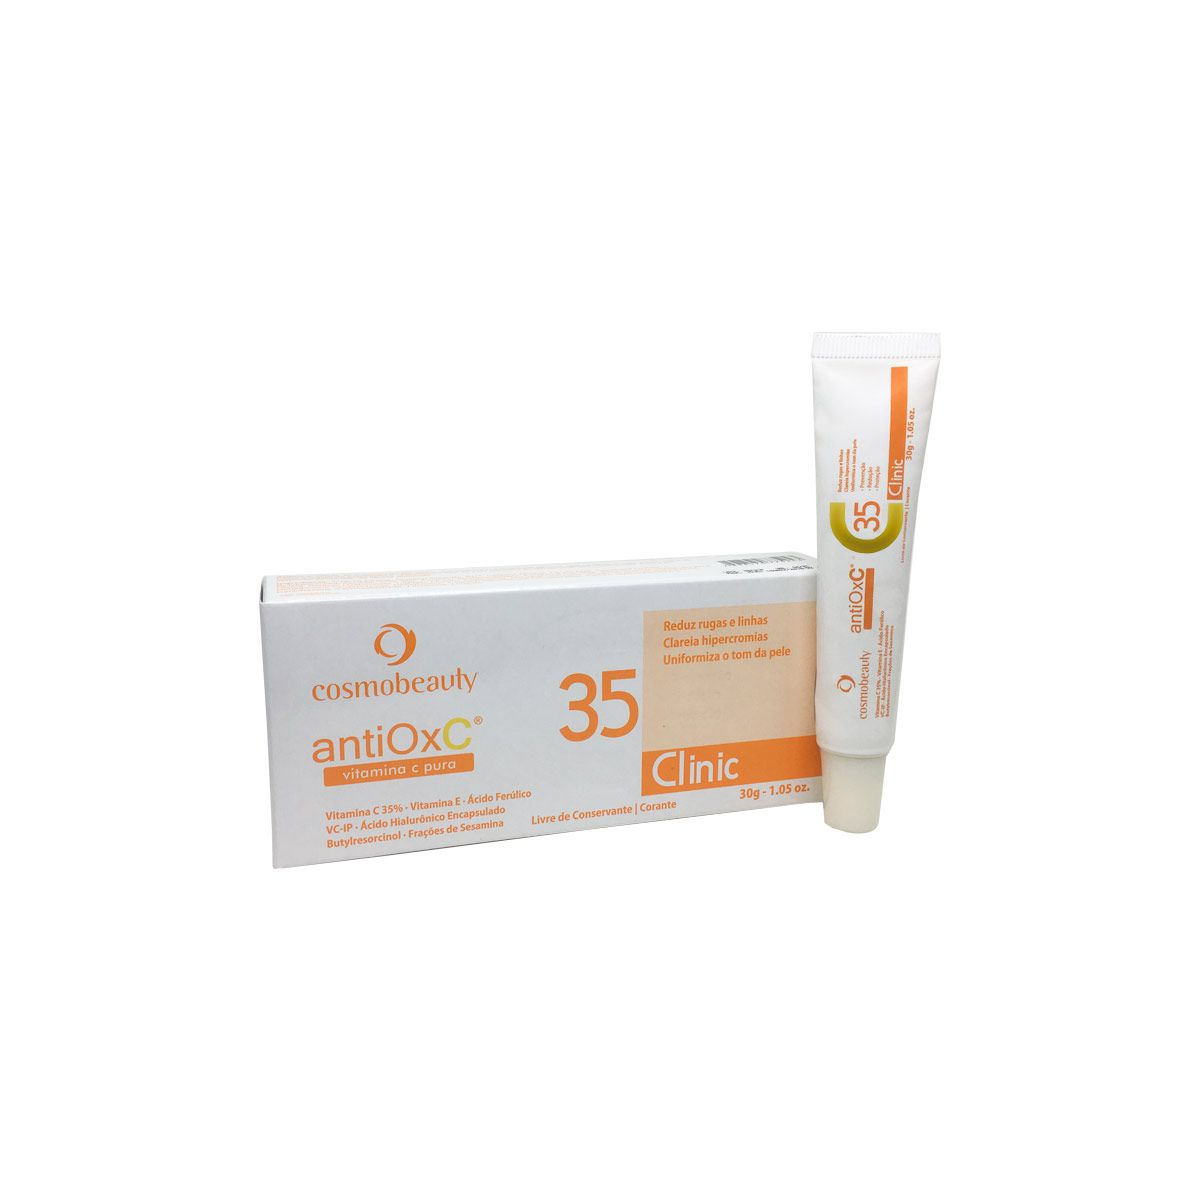 Vitamina C 35% Antiox C Clinic 30g